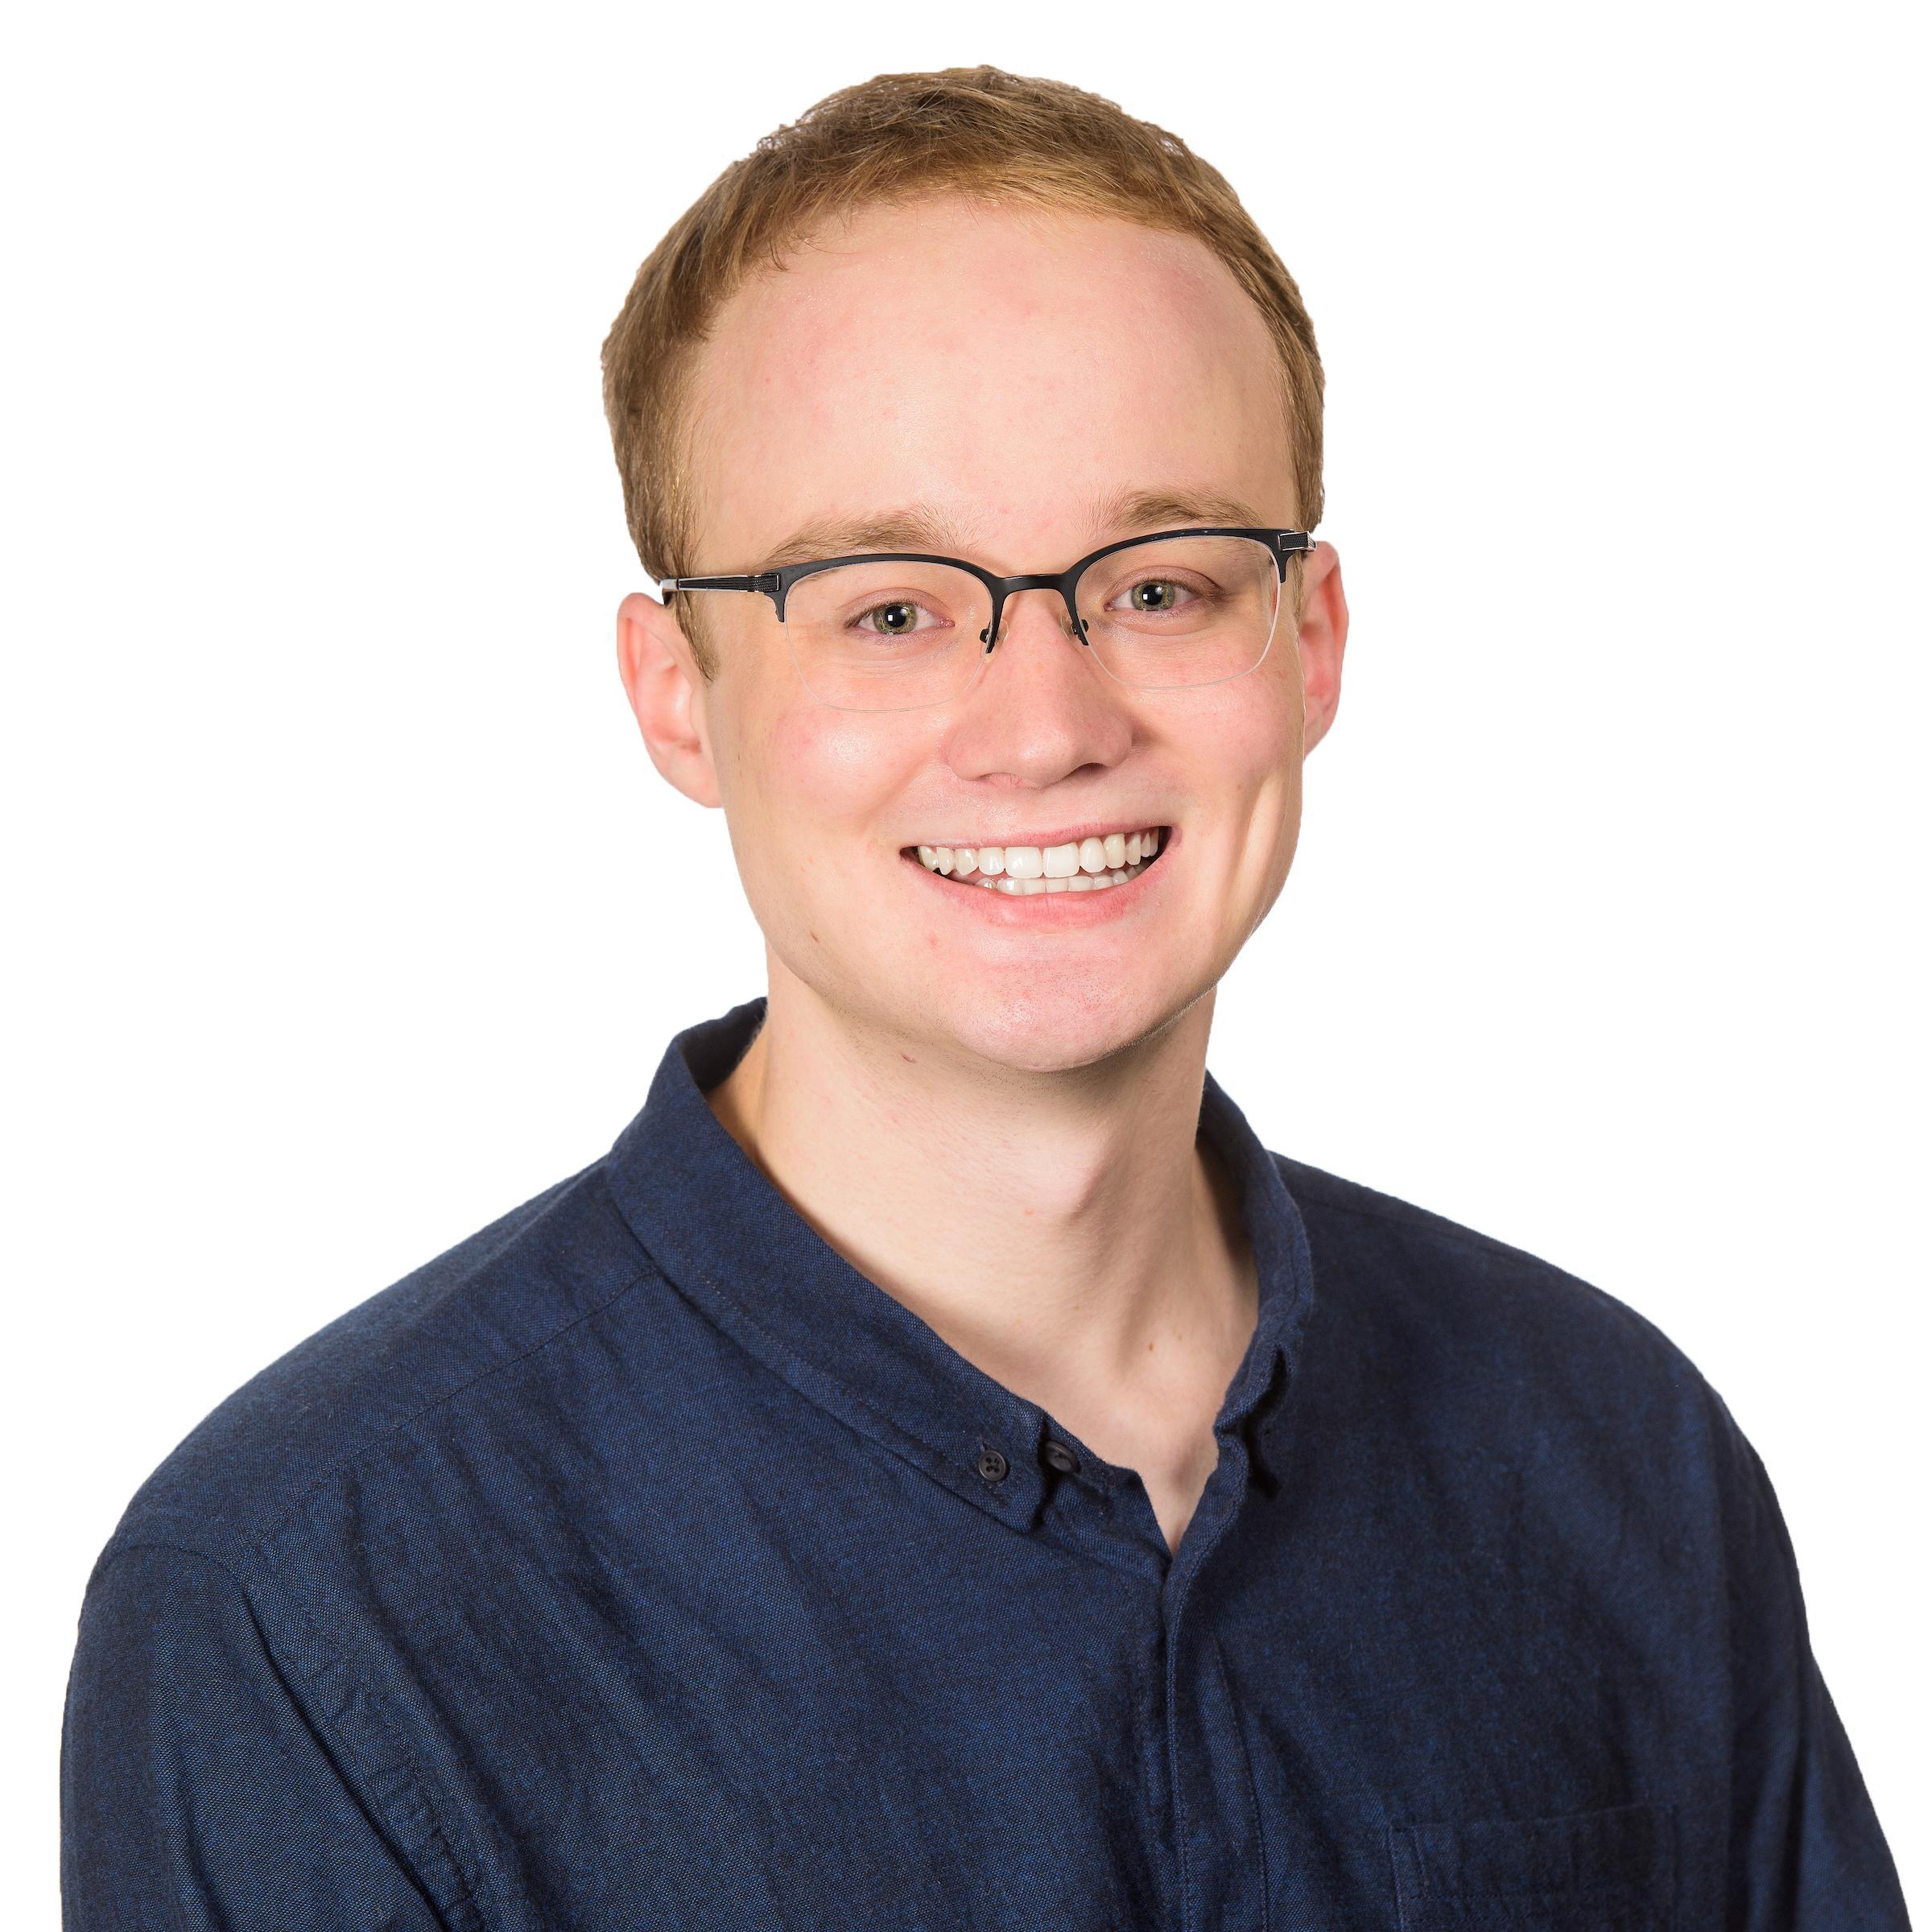 Kyle Stenseth